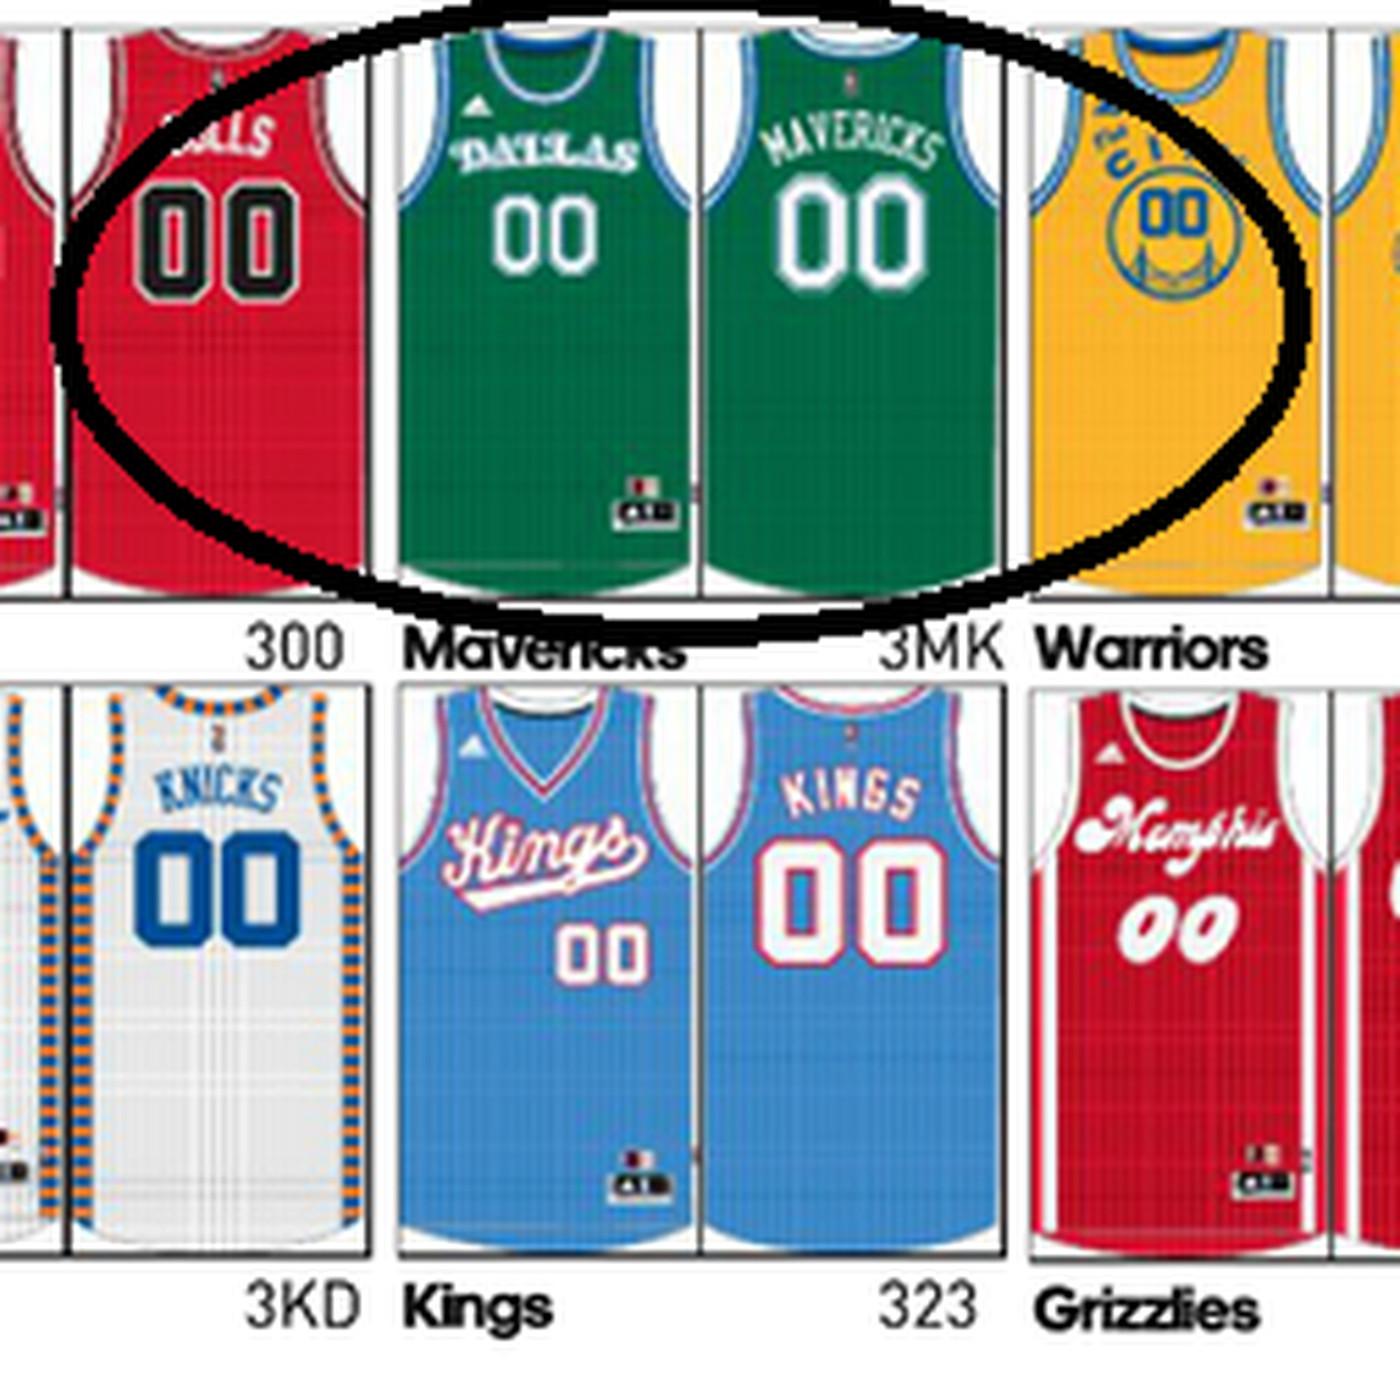 b8d89ac57 Mavericks apparently add retro green jerseys